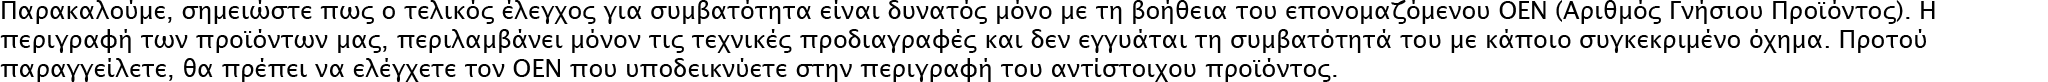 VALEO 074115562, 74115562, LF16176, 1100696, 0009830621 Φίλτρο λαδιού